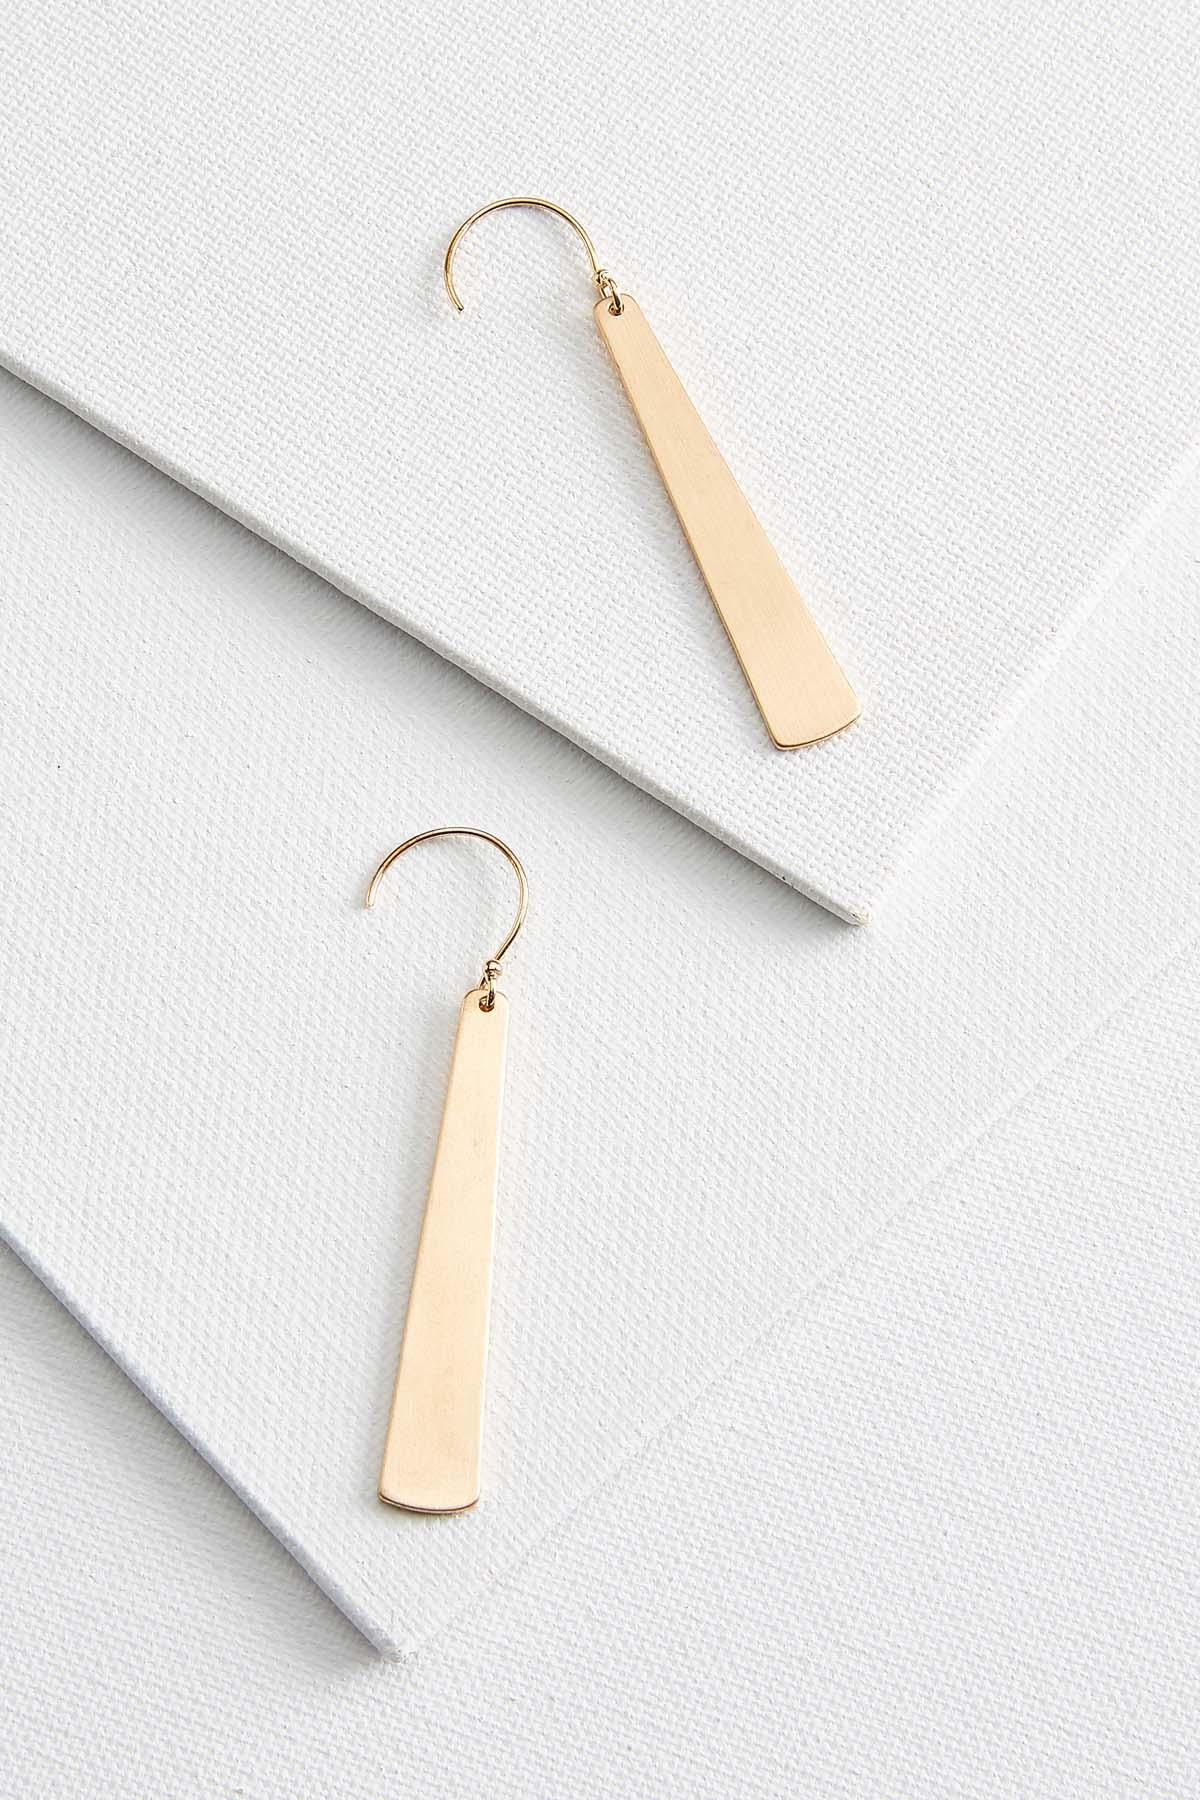 Brush Gold Paddle Earrings